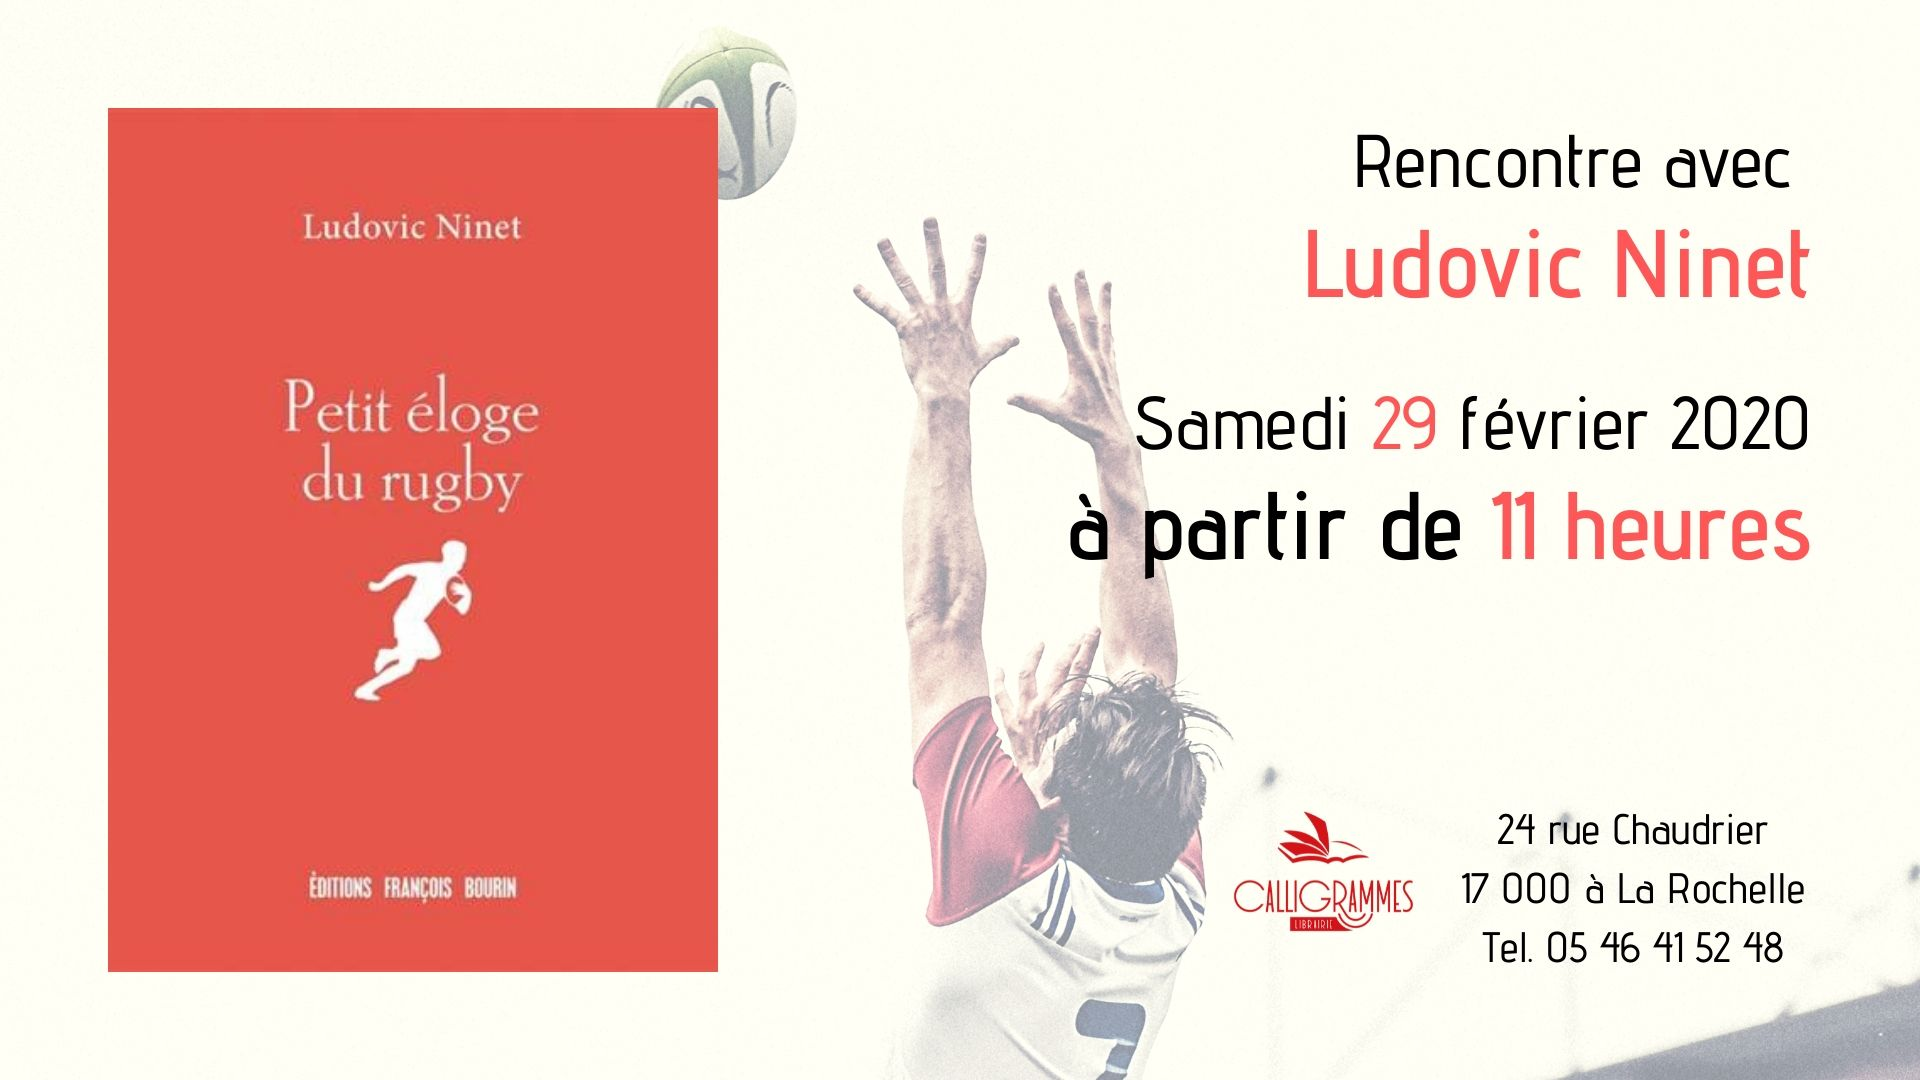 Rencontre avec Ludovic Ninet